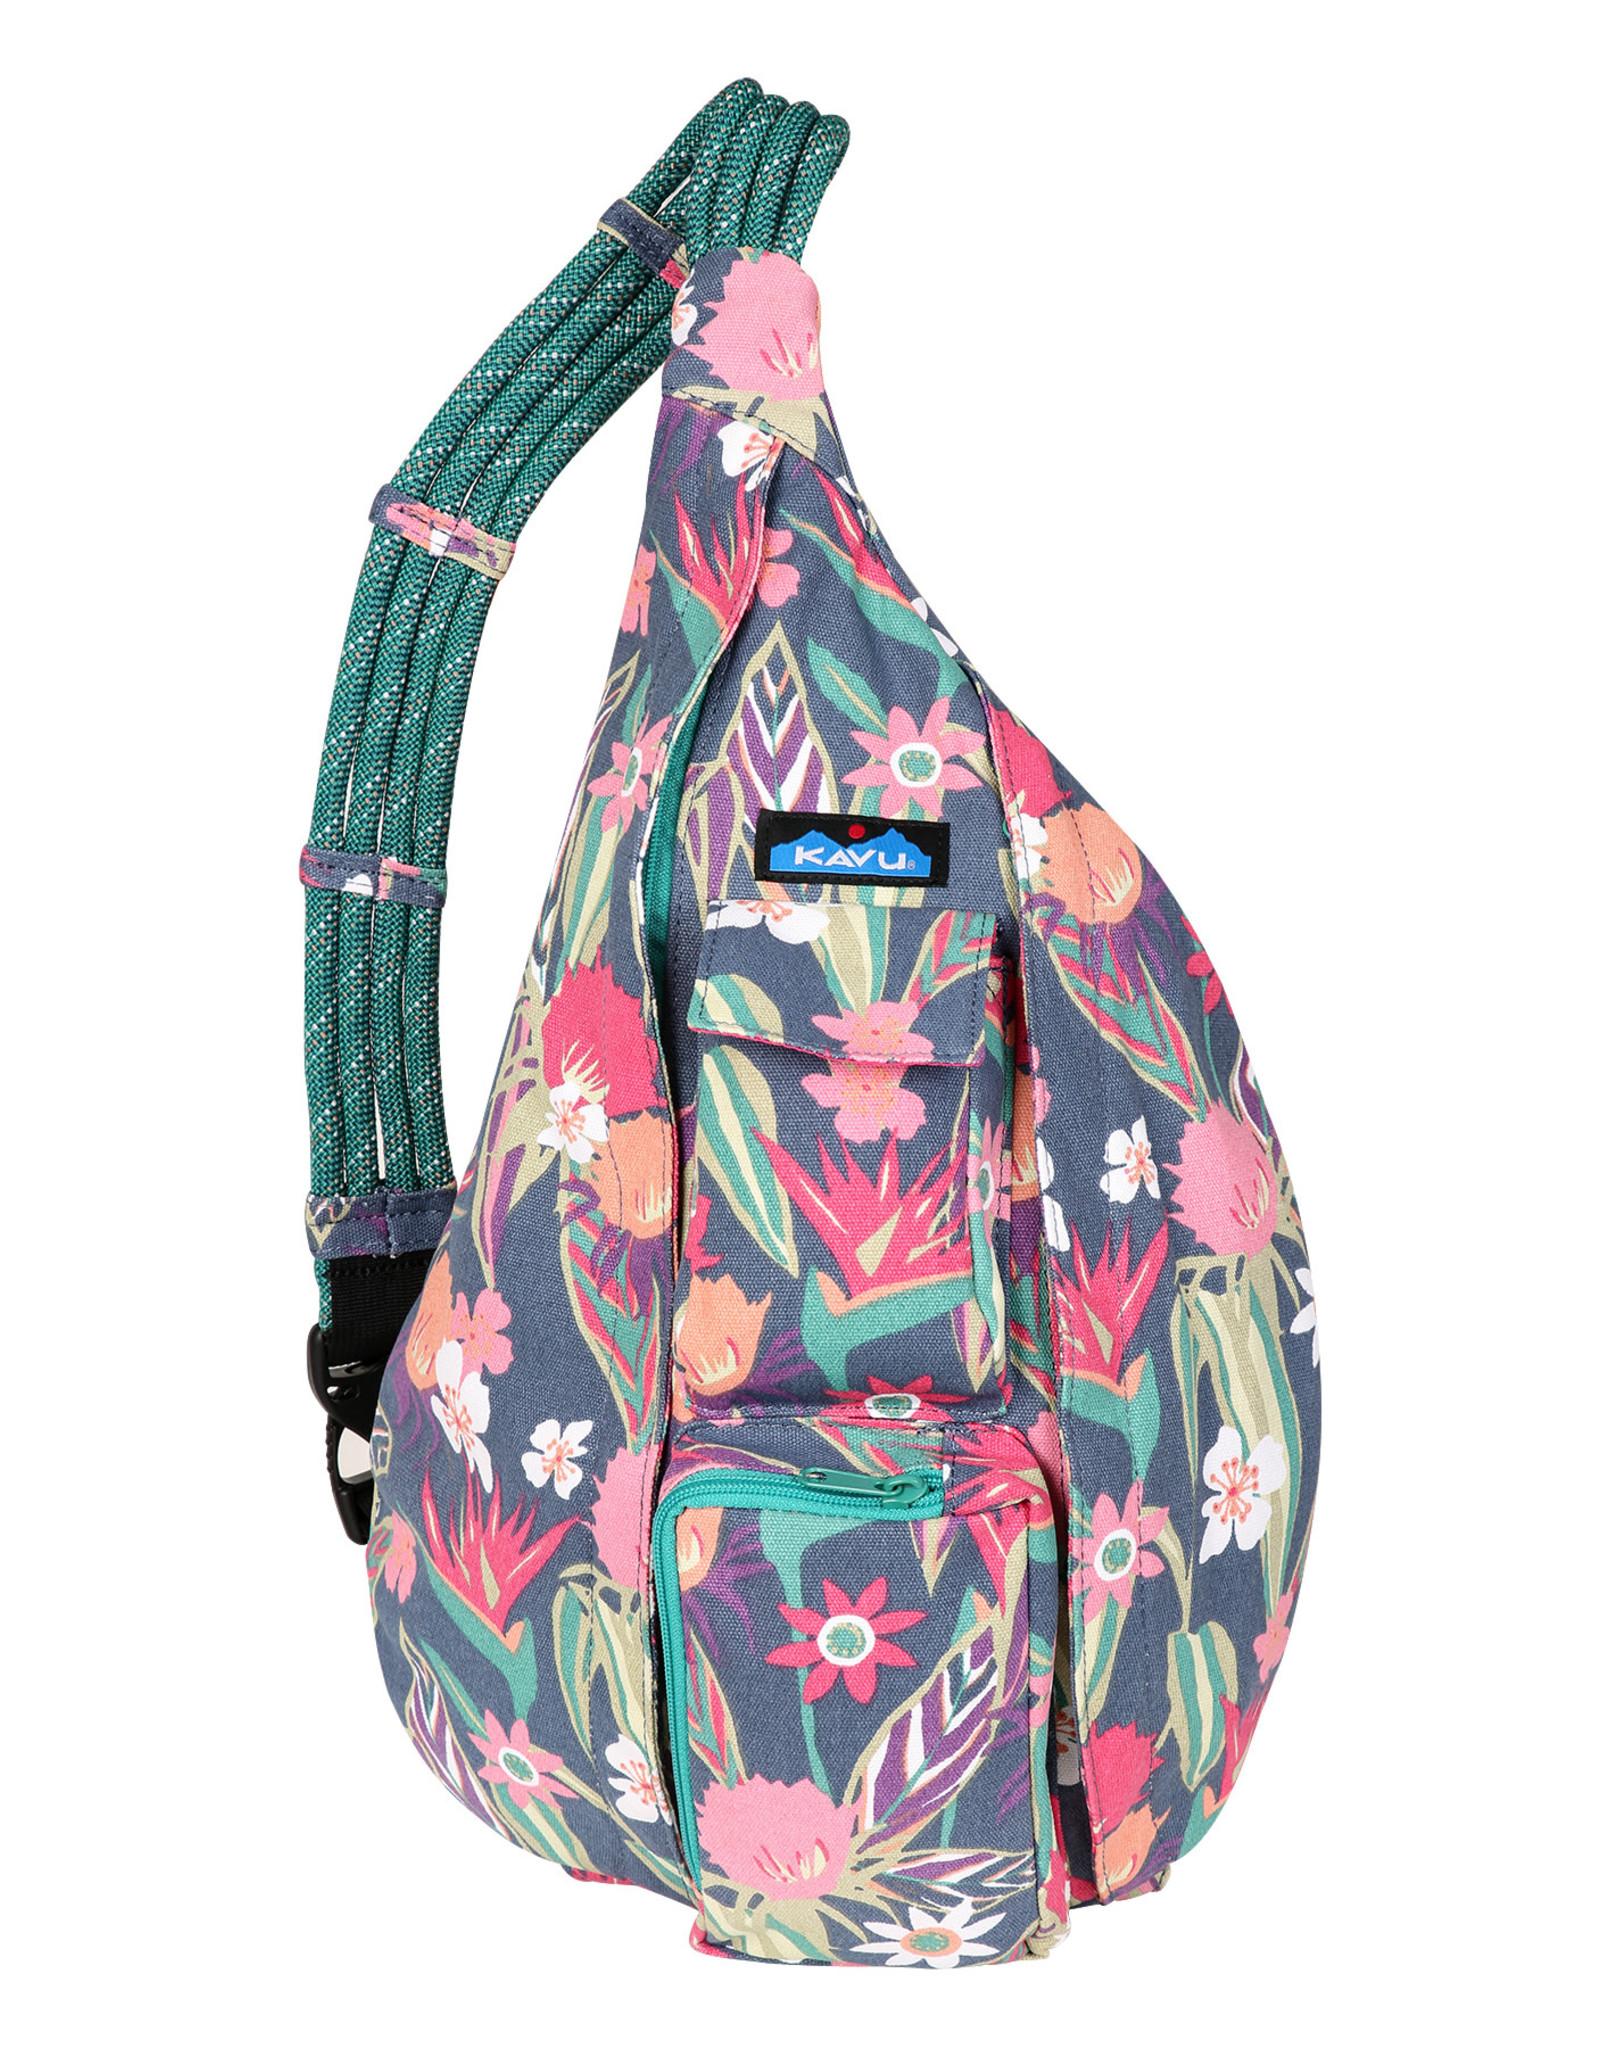 Kavu Rope Bag - Indigo Paradise